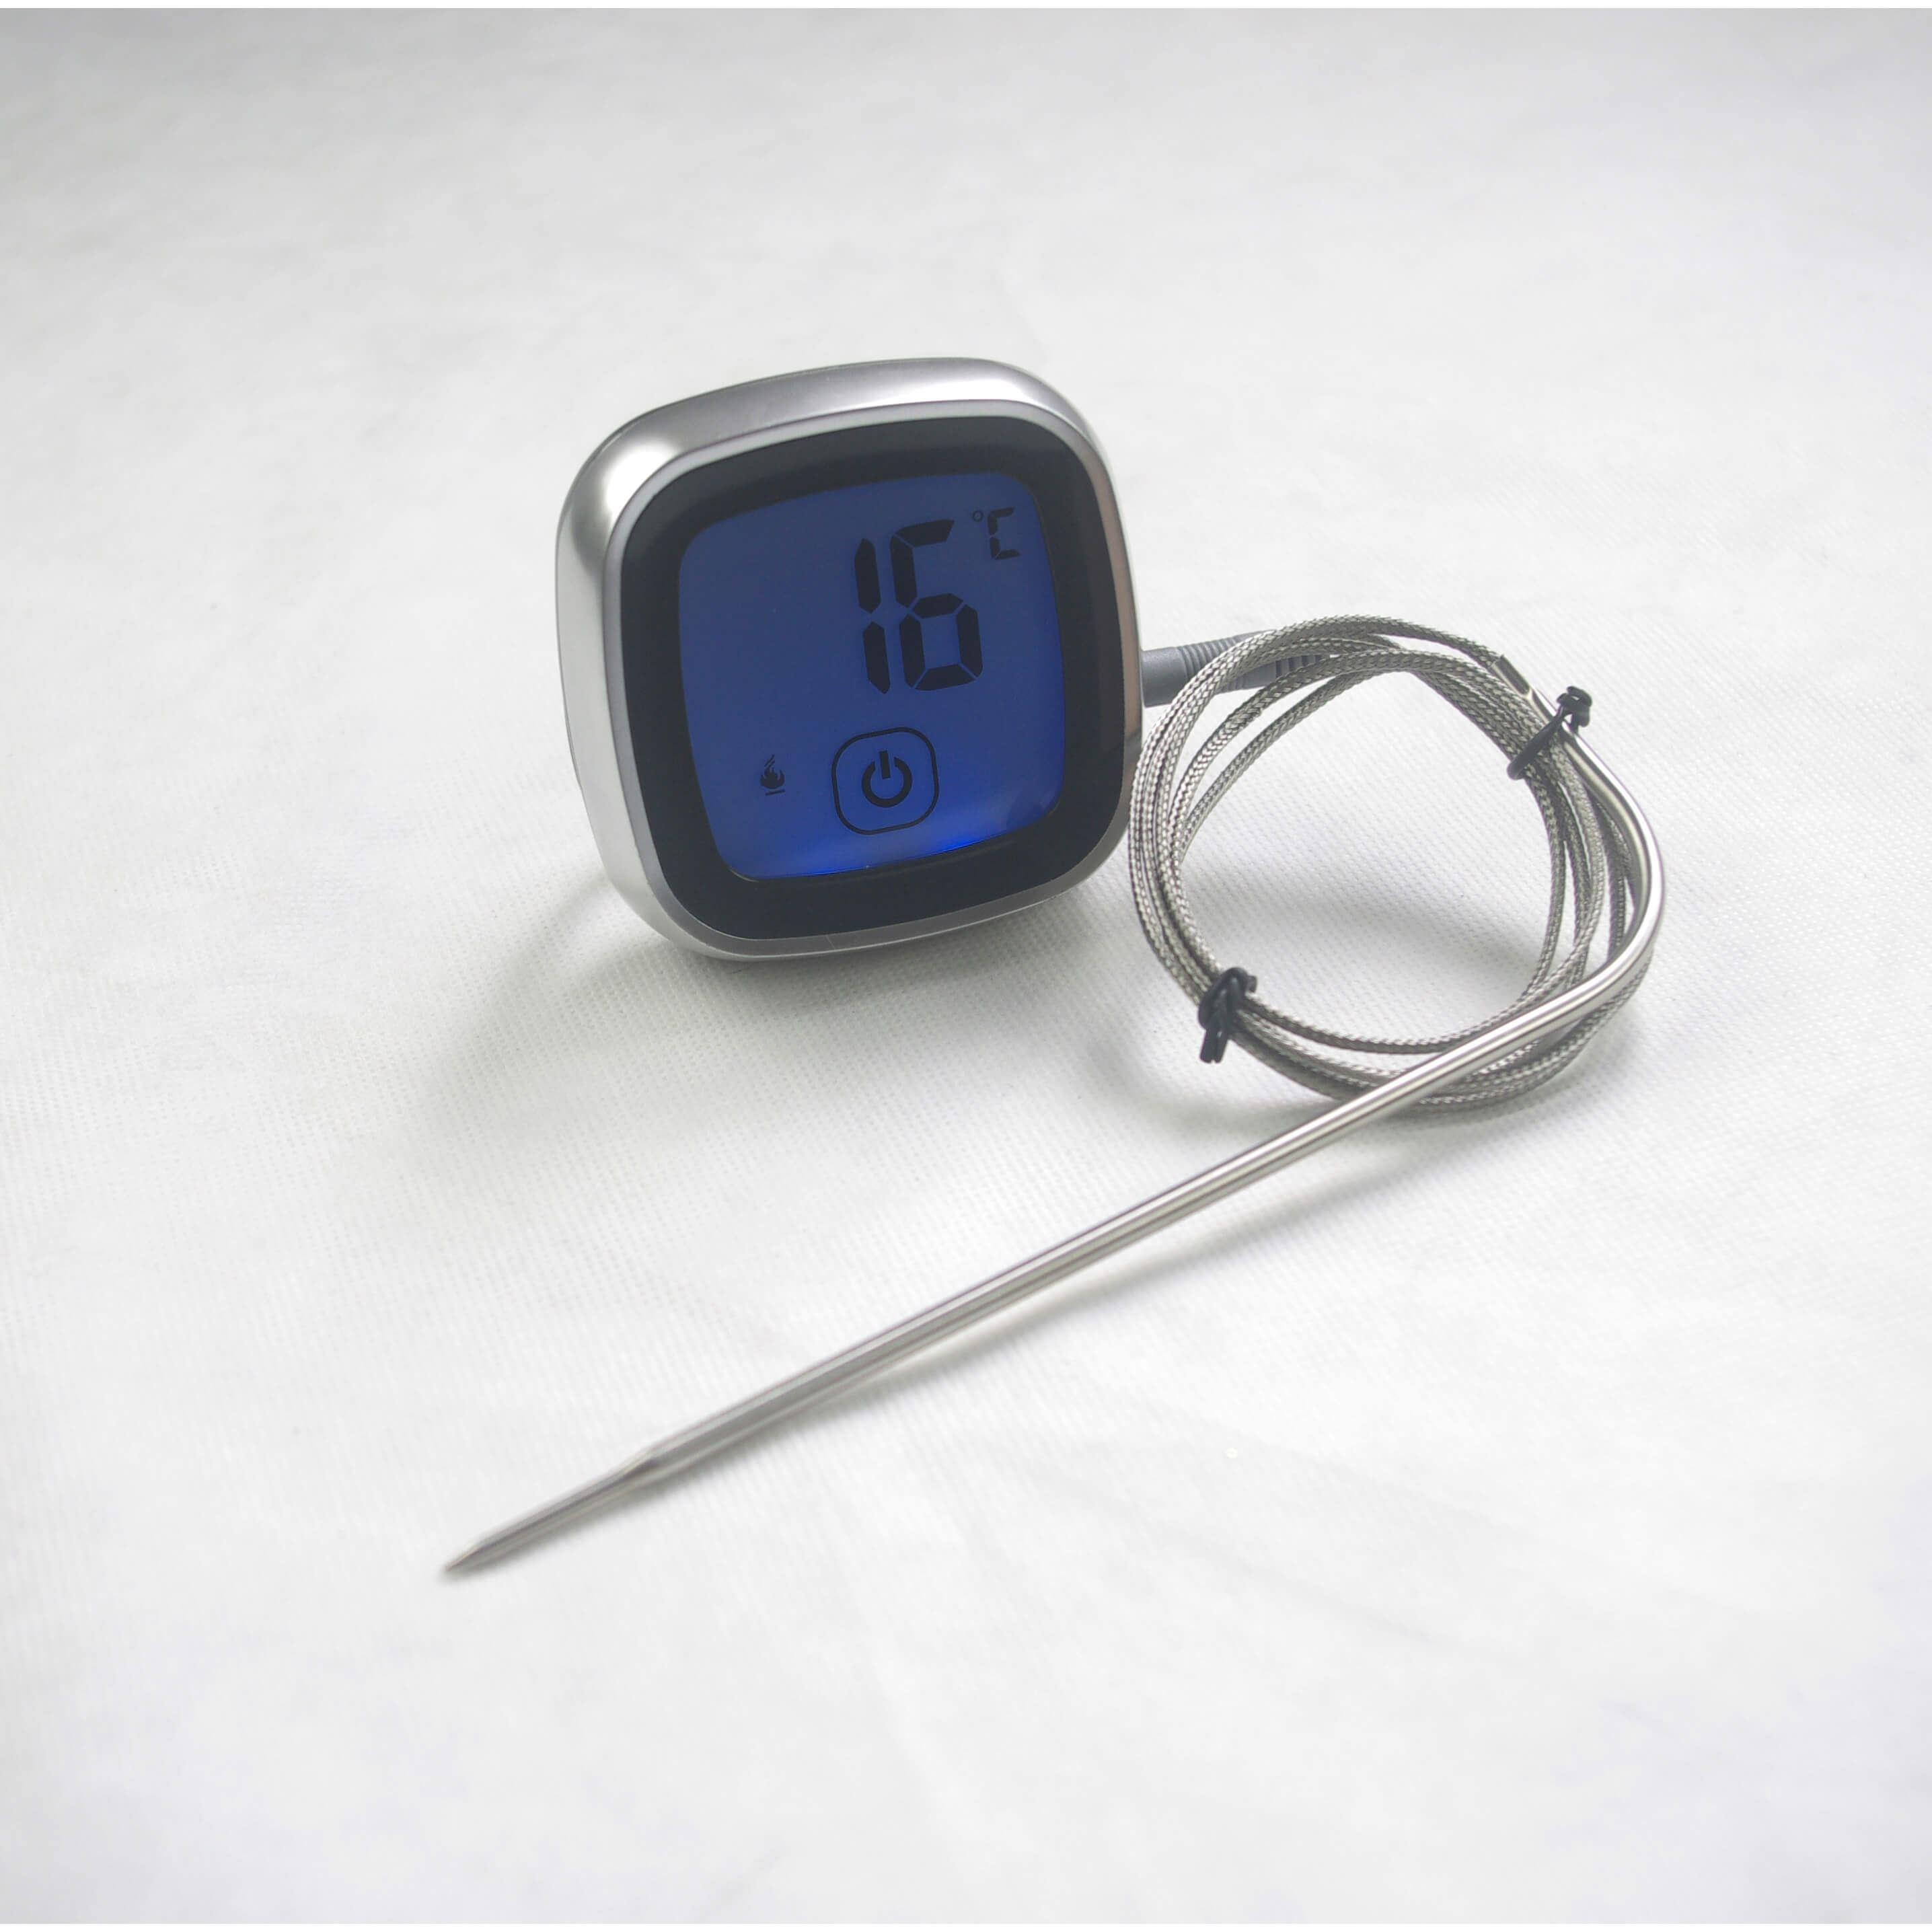 Termometerfabriken Digital Stegetermometer Bluetooth Termometer 96c58cb87e544